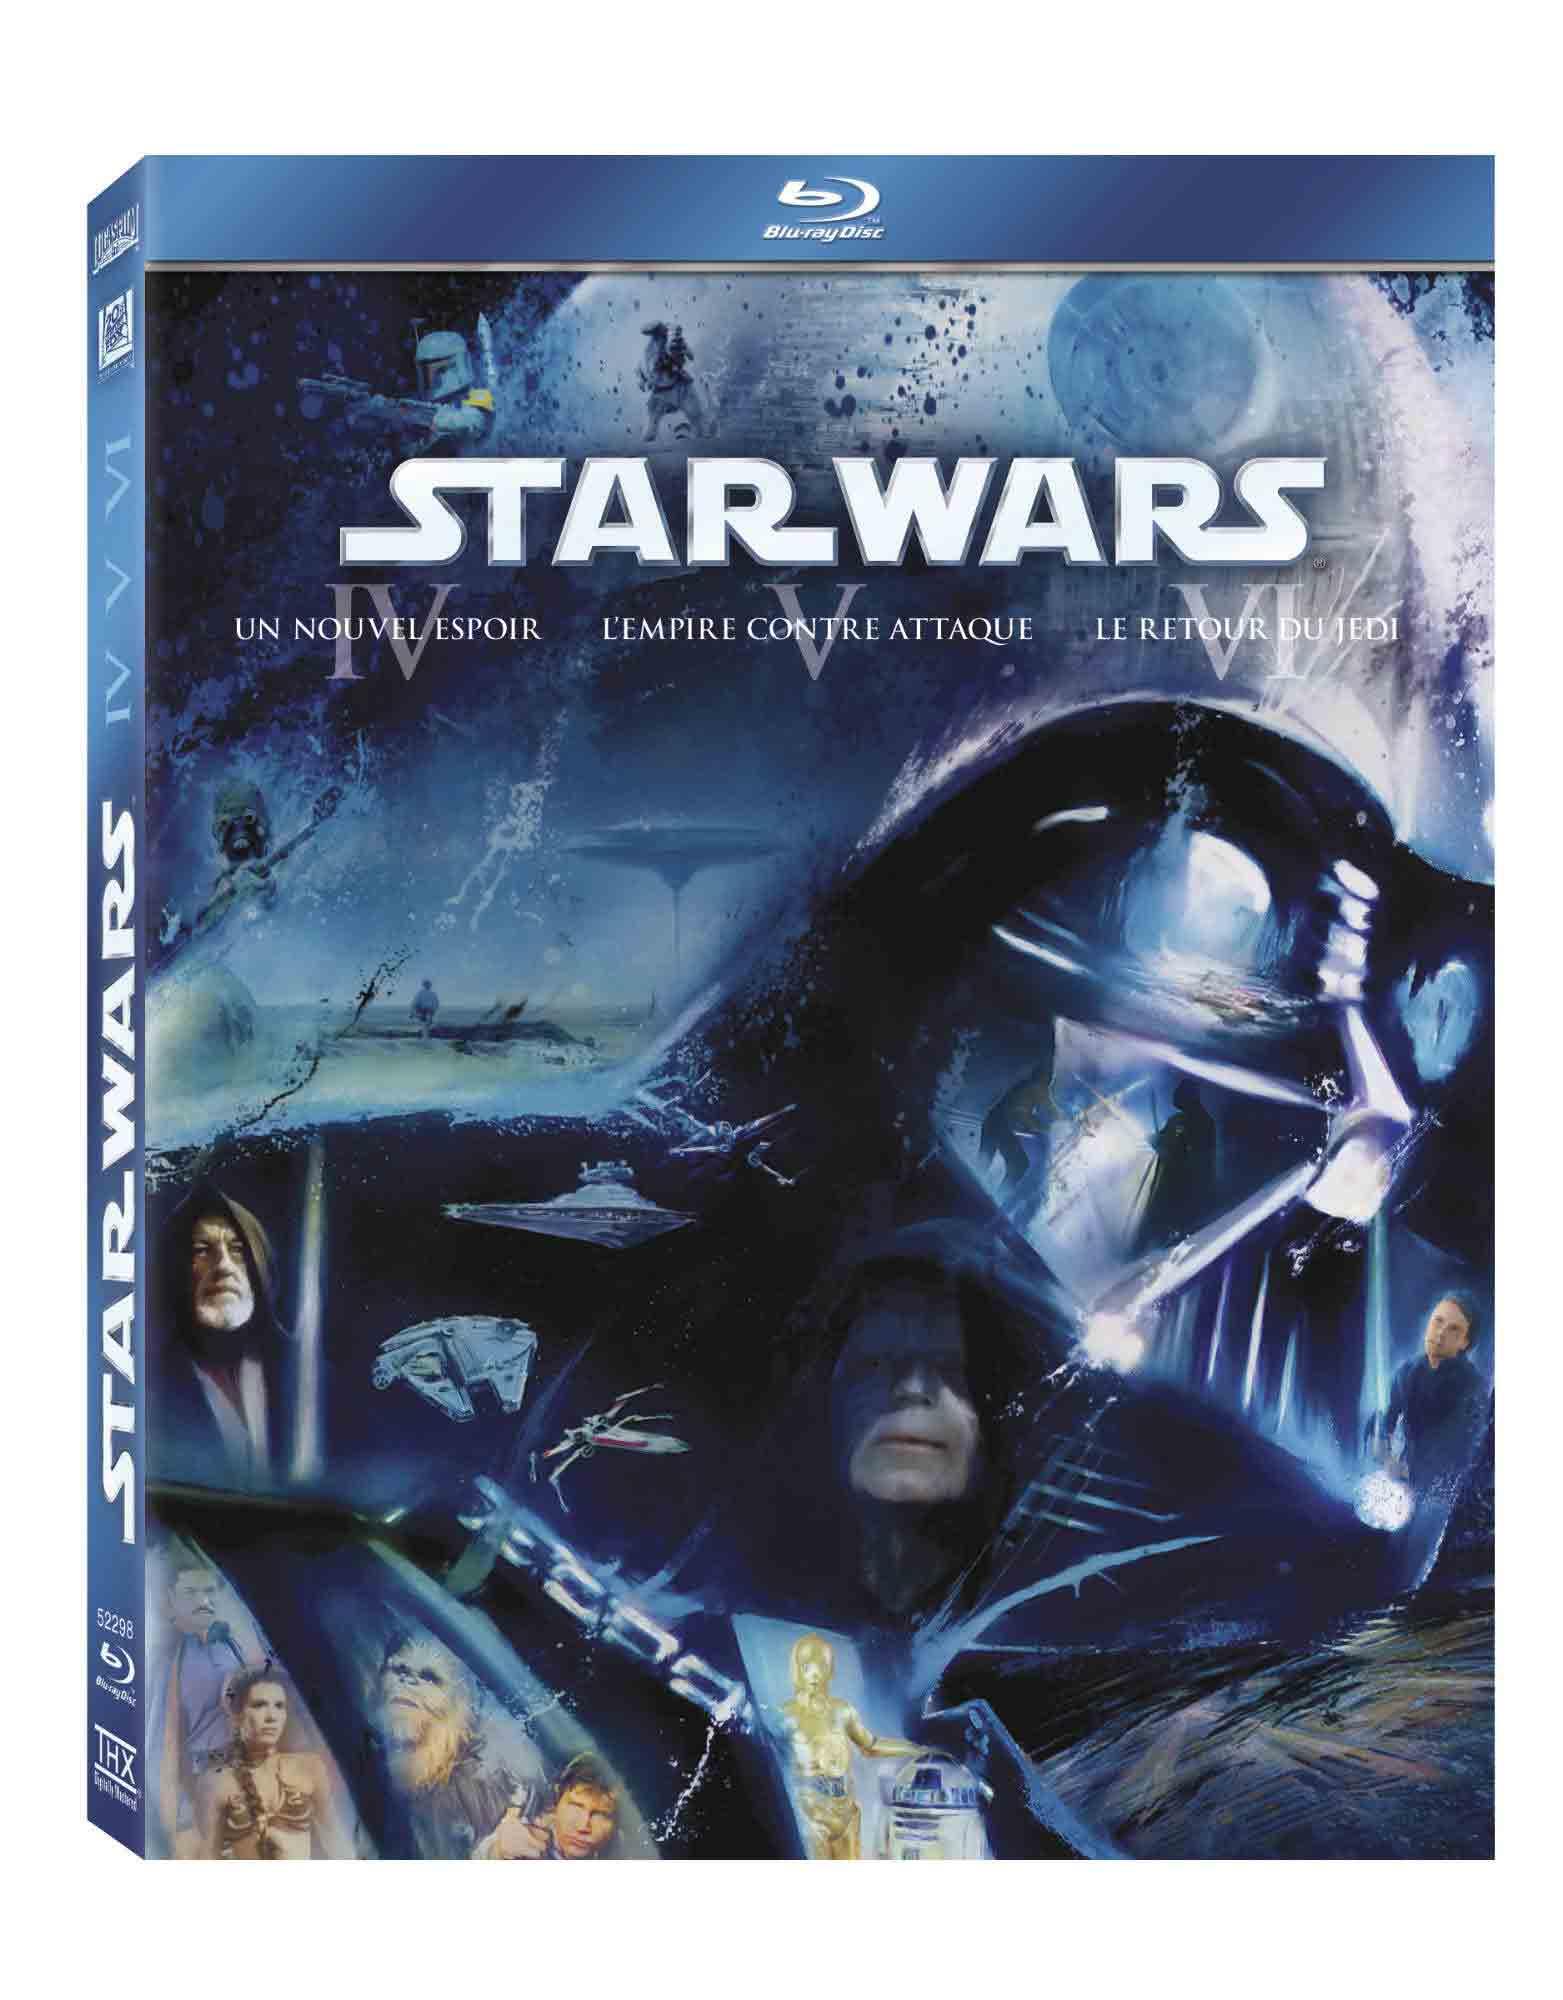 Star Wars : coffrets Blu-ray [Lucasfilm - 2011] - Page 5 19732389